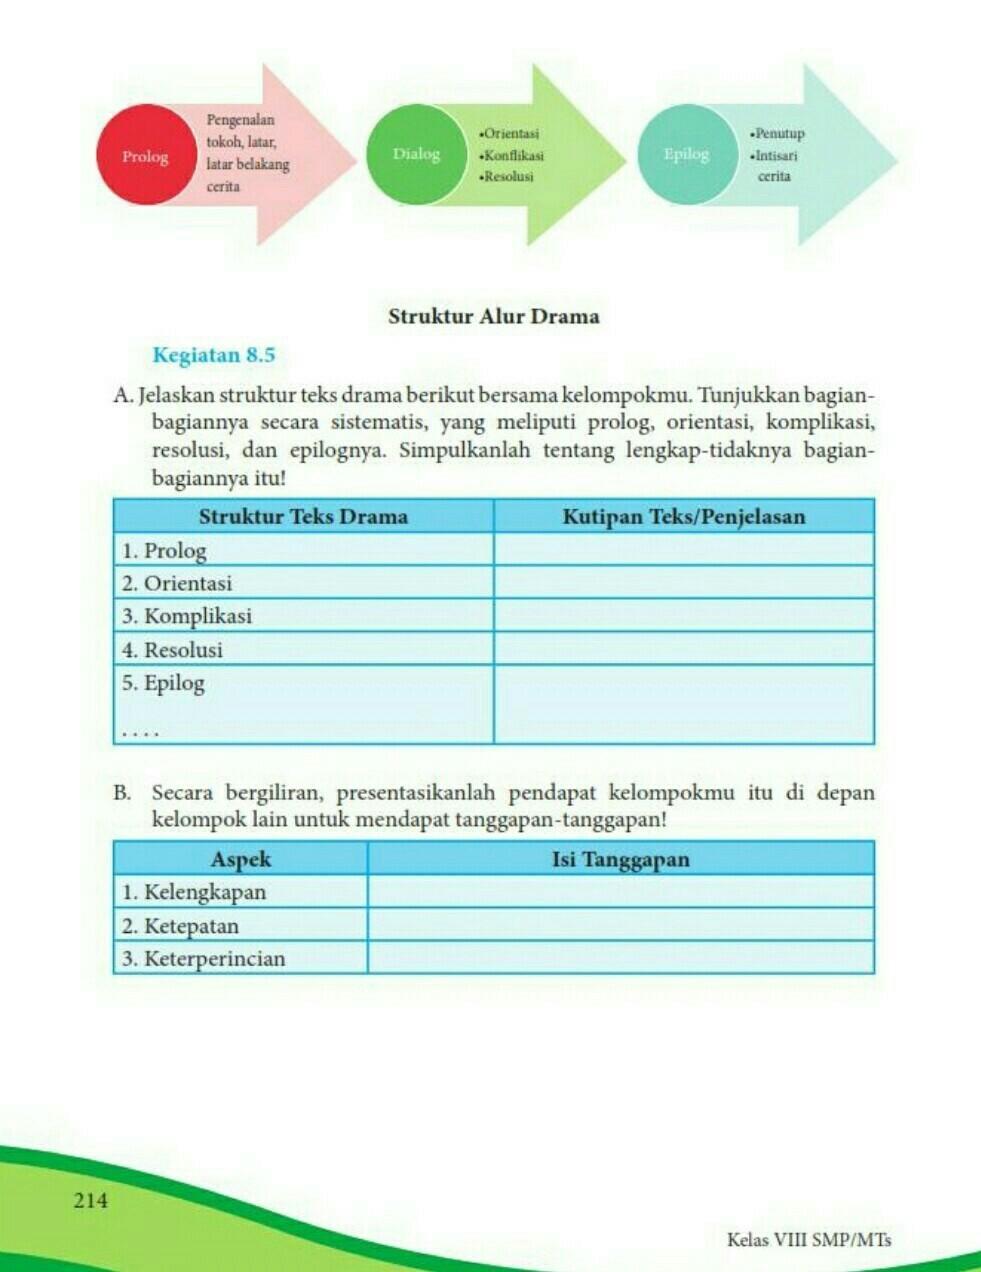 Kegiatan 8.5 Bahasa Indonesia Kelas 8 Semester 2 : kegiatan, bahasa, indonesia, kelas, semester, Jawaban, Paket, Kelas, Halaman, Berdasarkan, Drama, Brainly.co.id